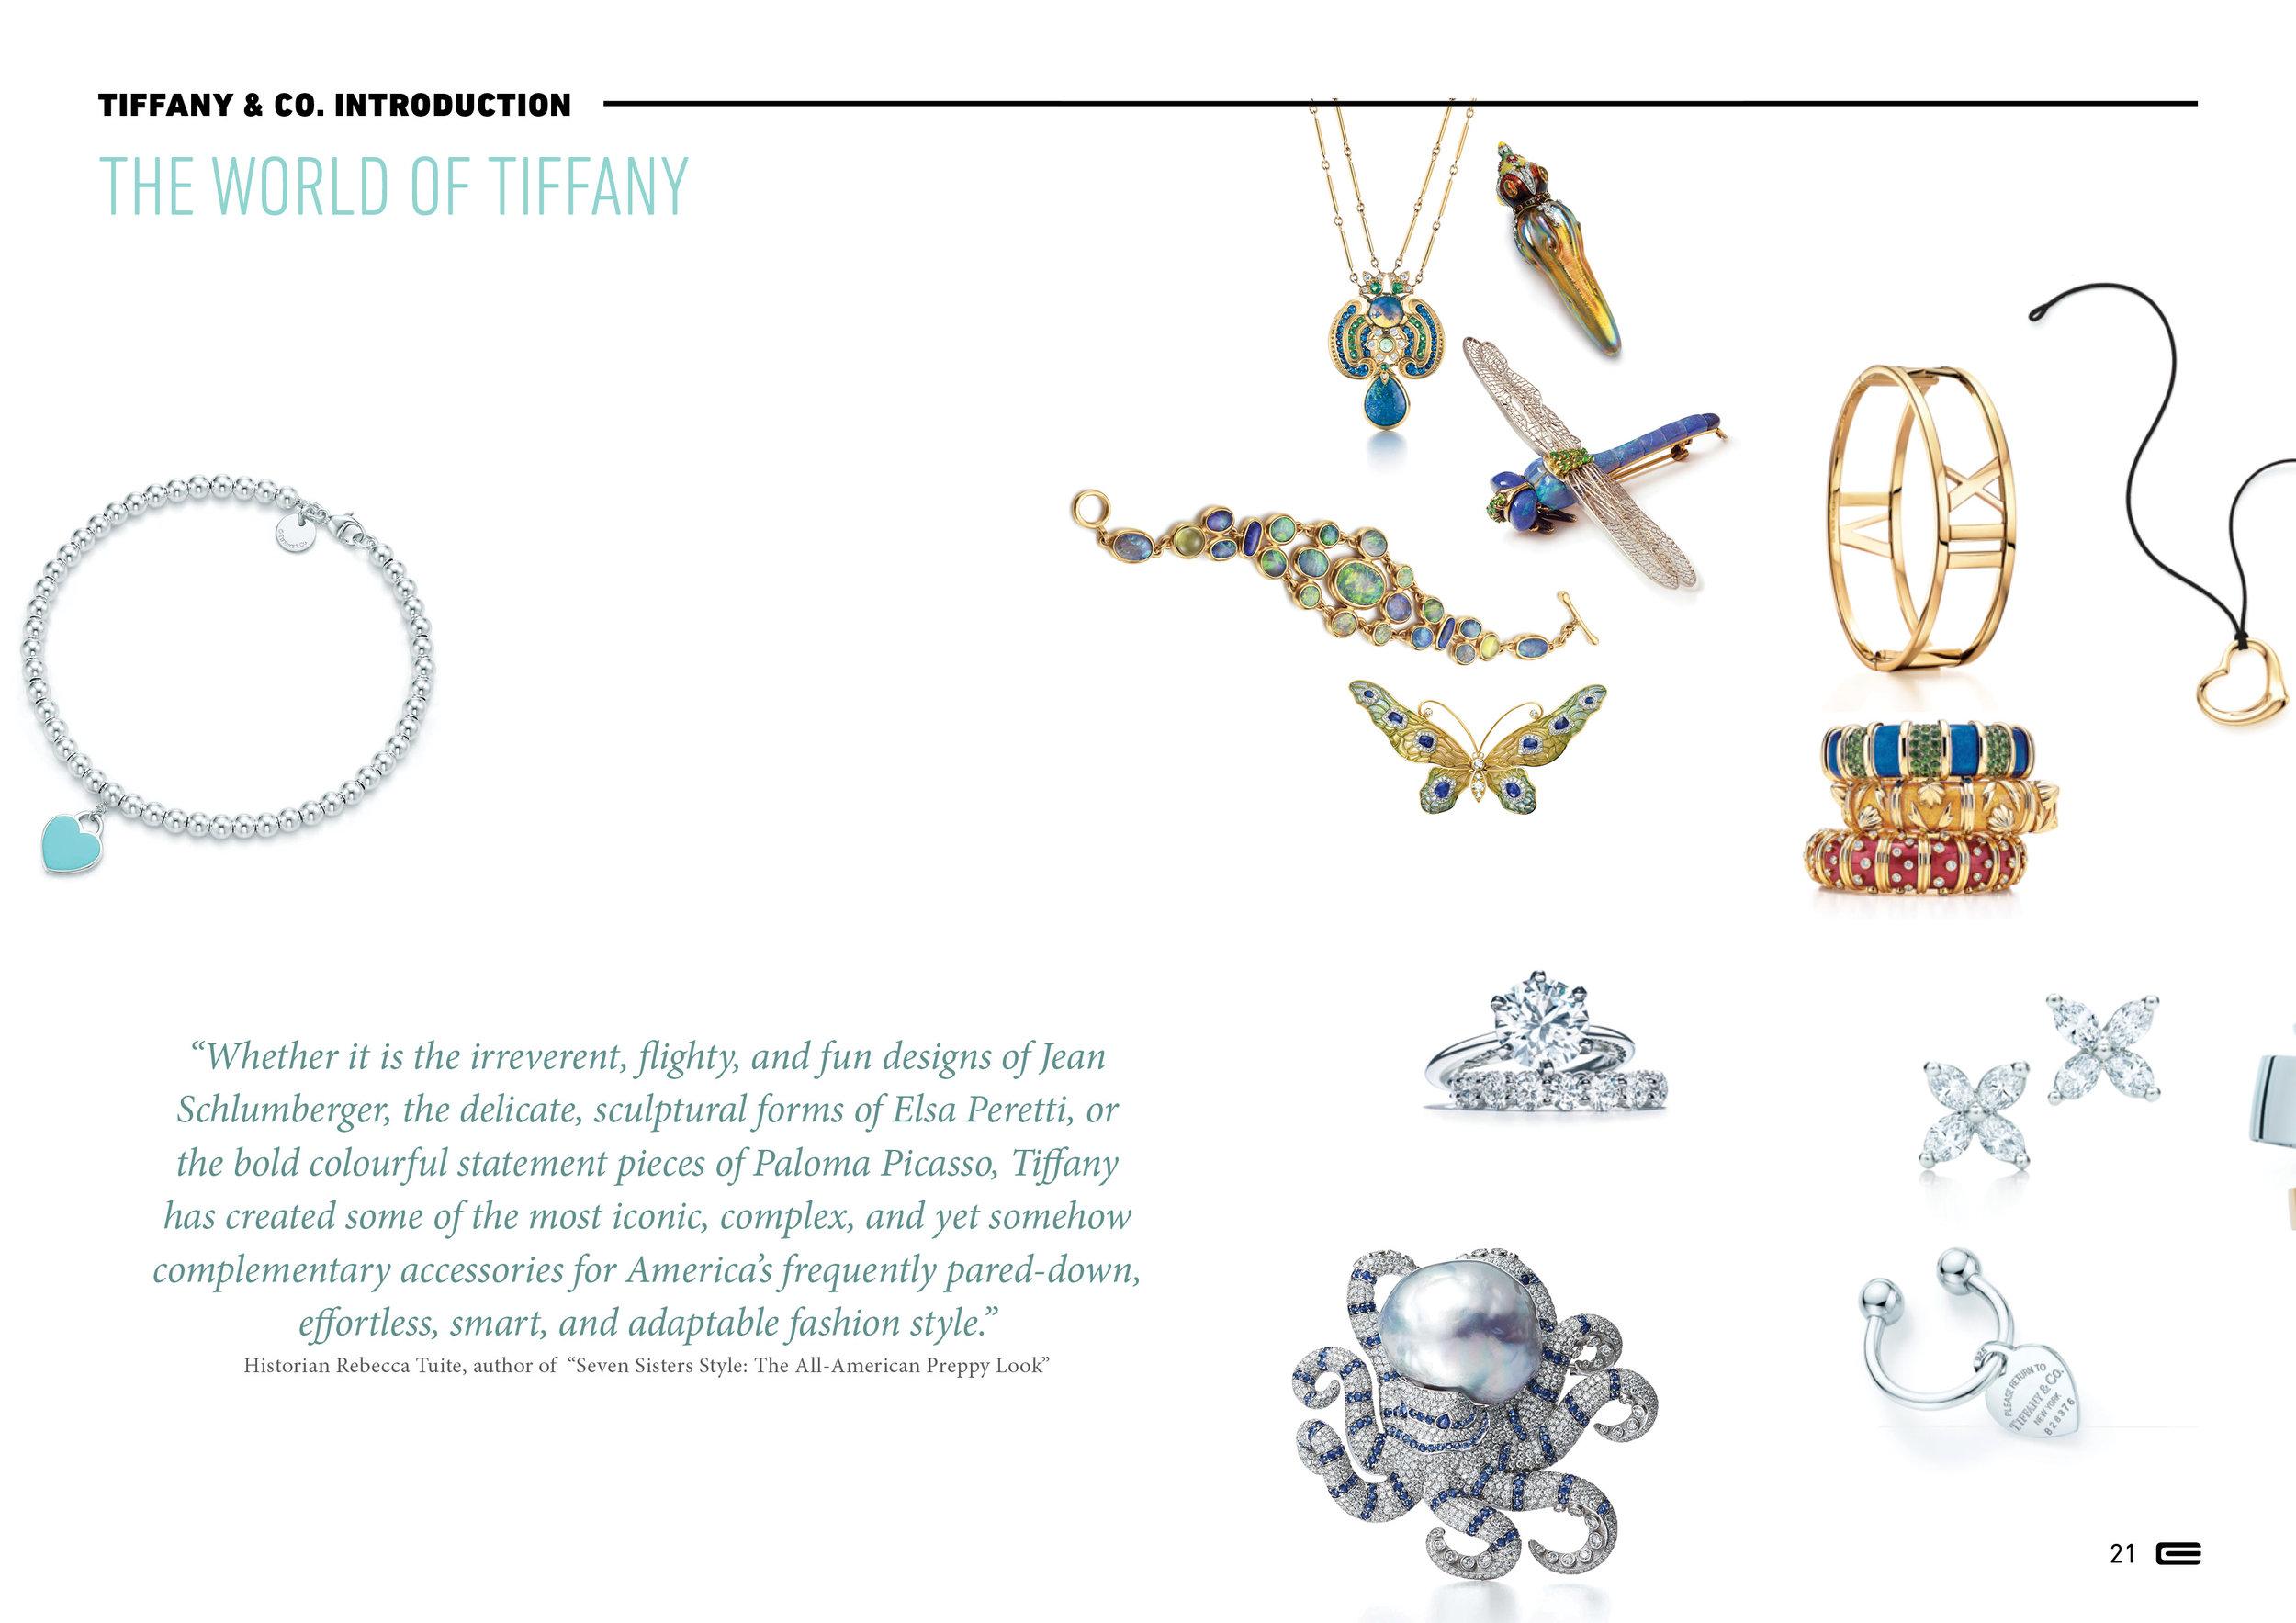 EC - VIC 2018 Presentation on Tiffany21.jpg